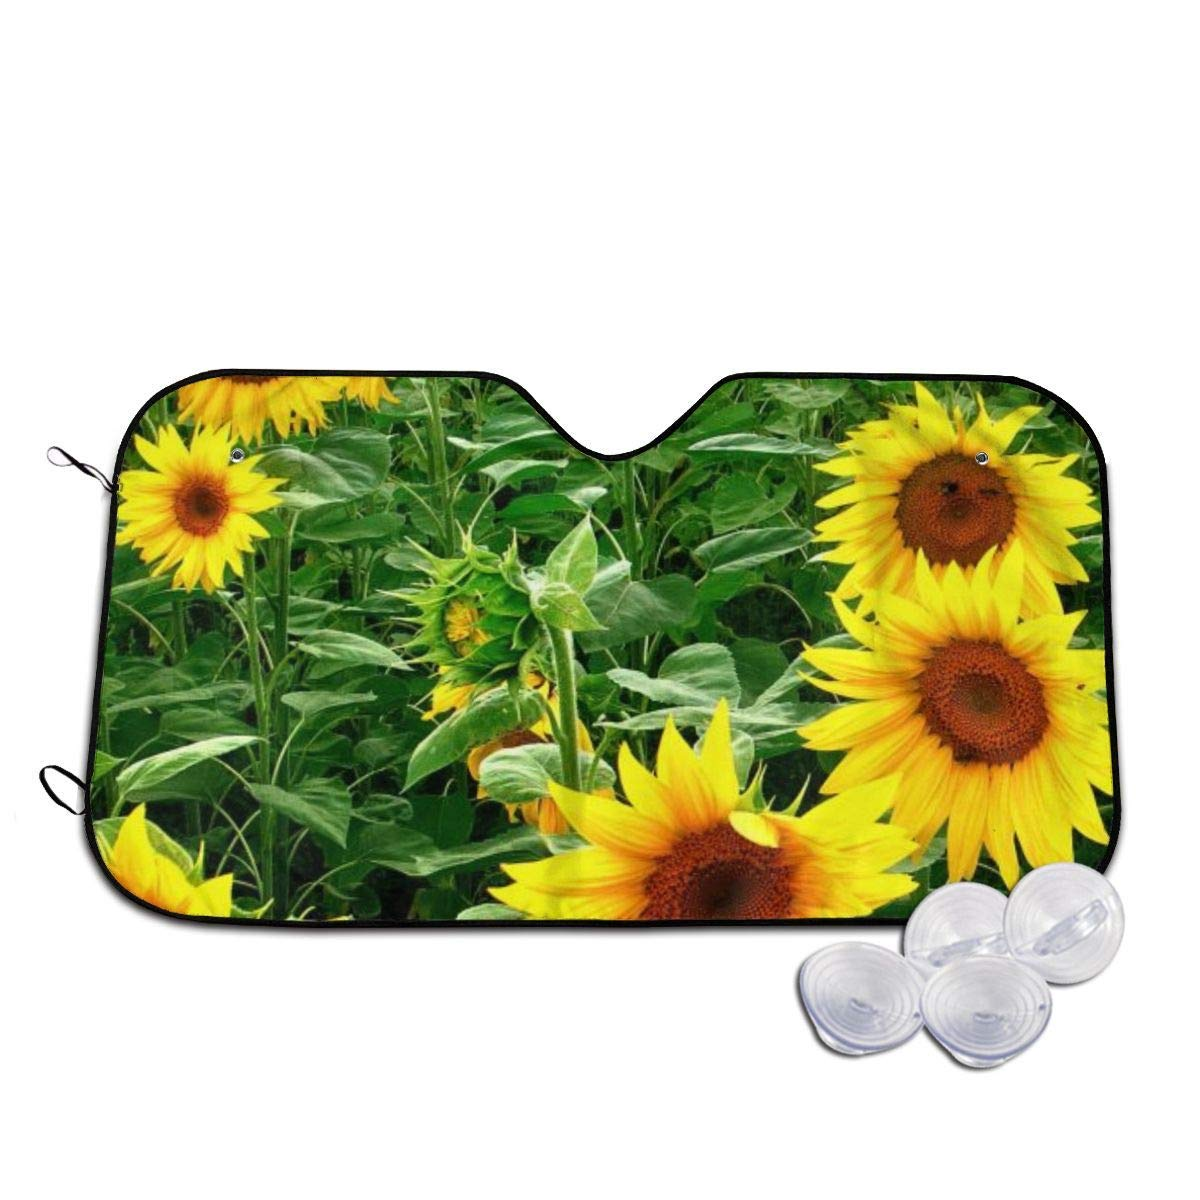 Yellowsunflowerflowerfieldwallpaper Home Universal Front Auto Car Windshield Sun Shade Sun Visor Car Sun Shade Keep Vehicle Accessories,Size 55x30 Inch by huagu